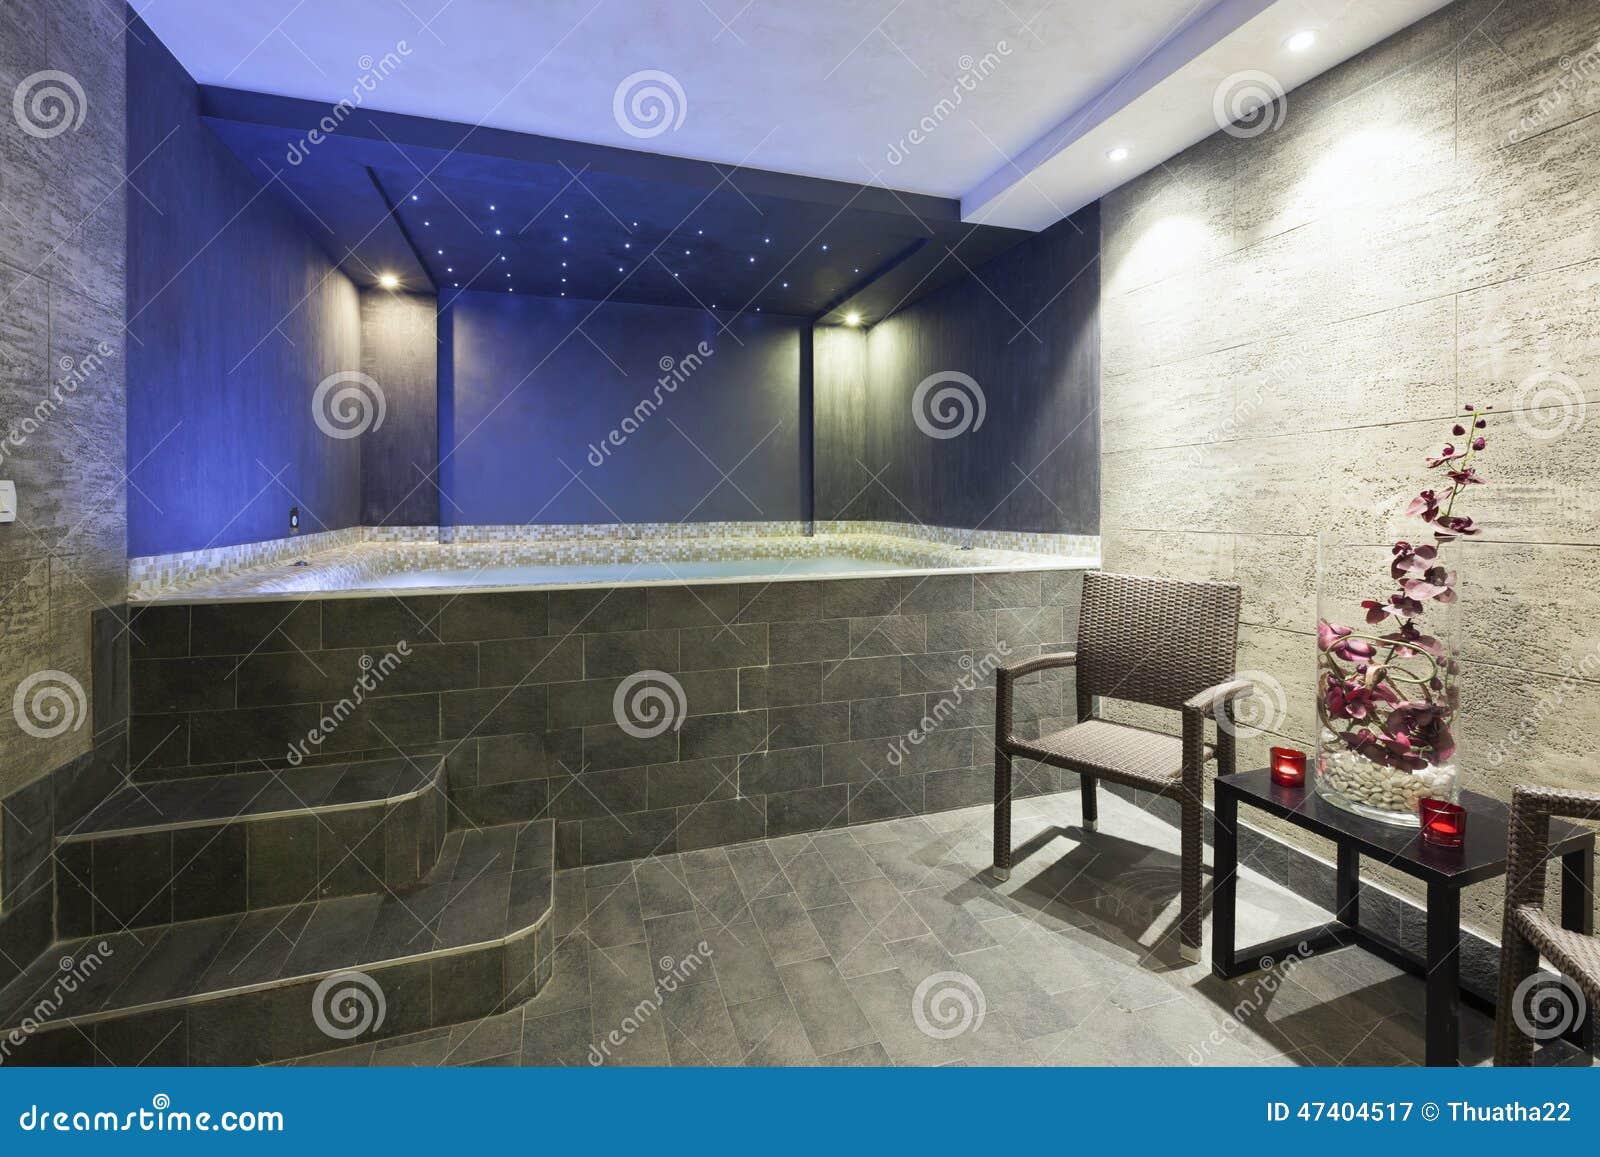 Interior of a modern hotel bathroom jacuzzi royalty free - Jacuzzi de lujo ...